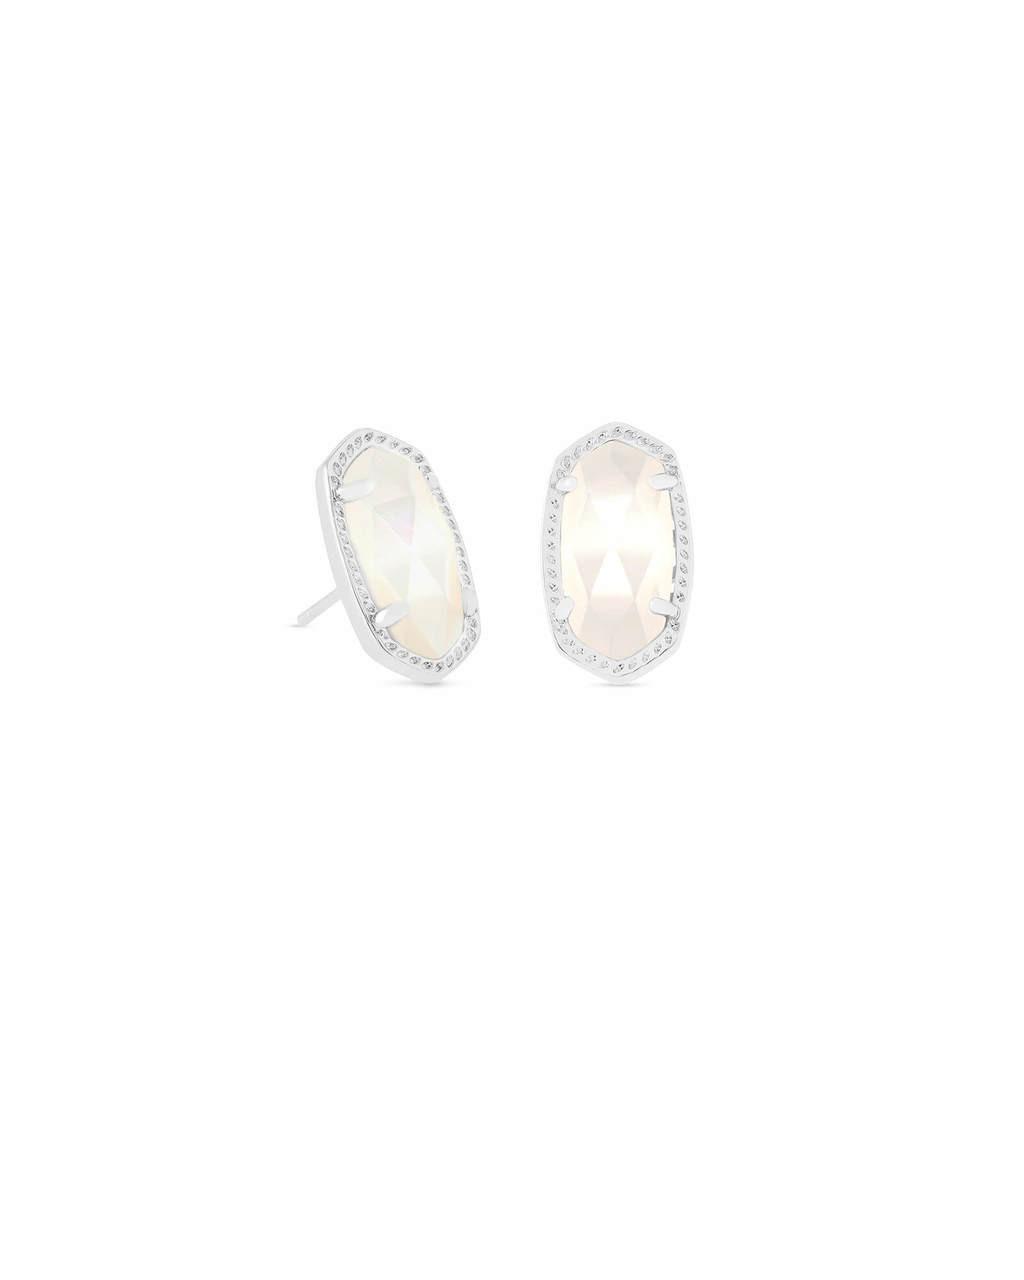 9b7dc4c83 Ellie Silver Stud Earrings In Ivory Pearl - Thompson's